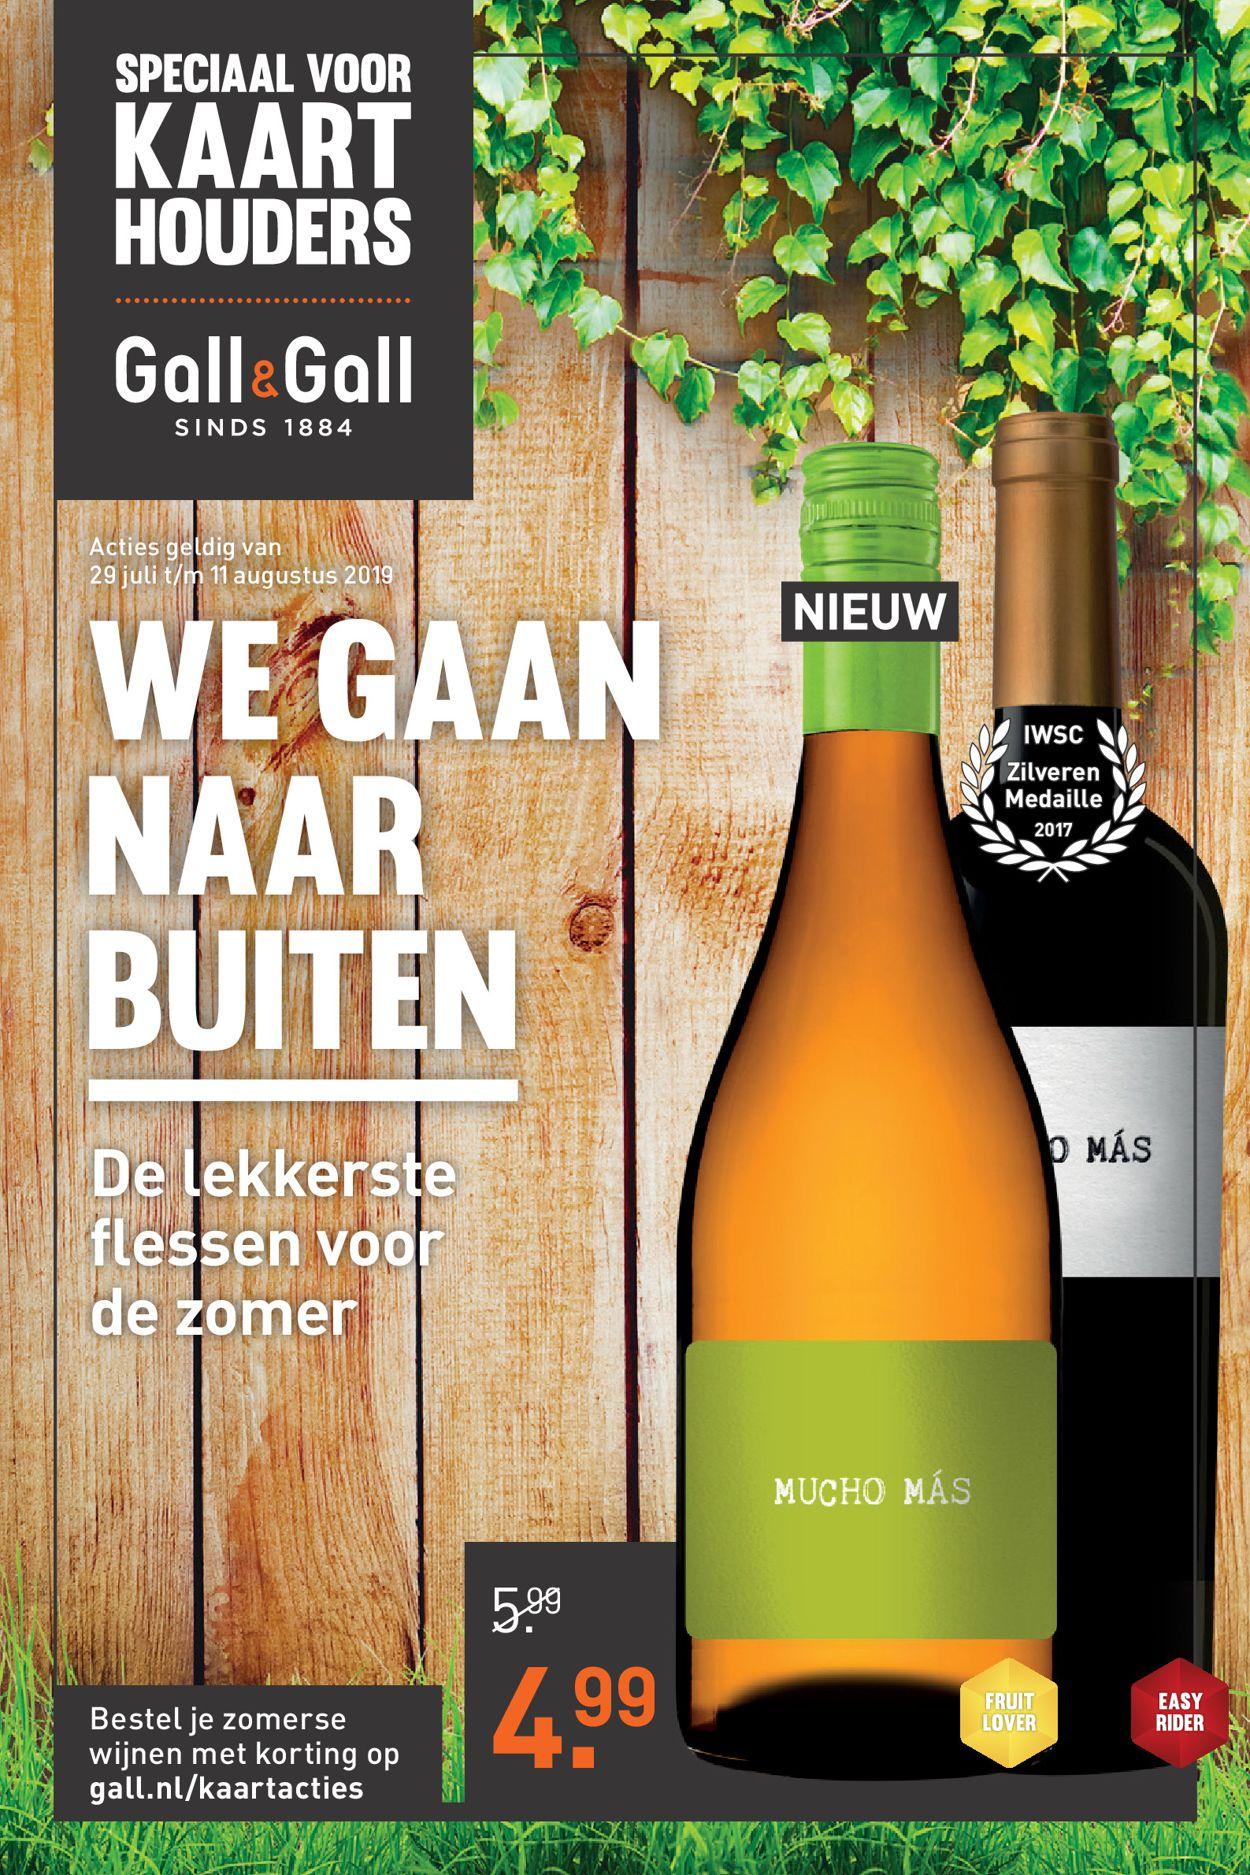 Gall & Gall Folder - 29.07-11.08.2019